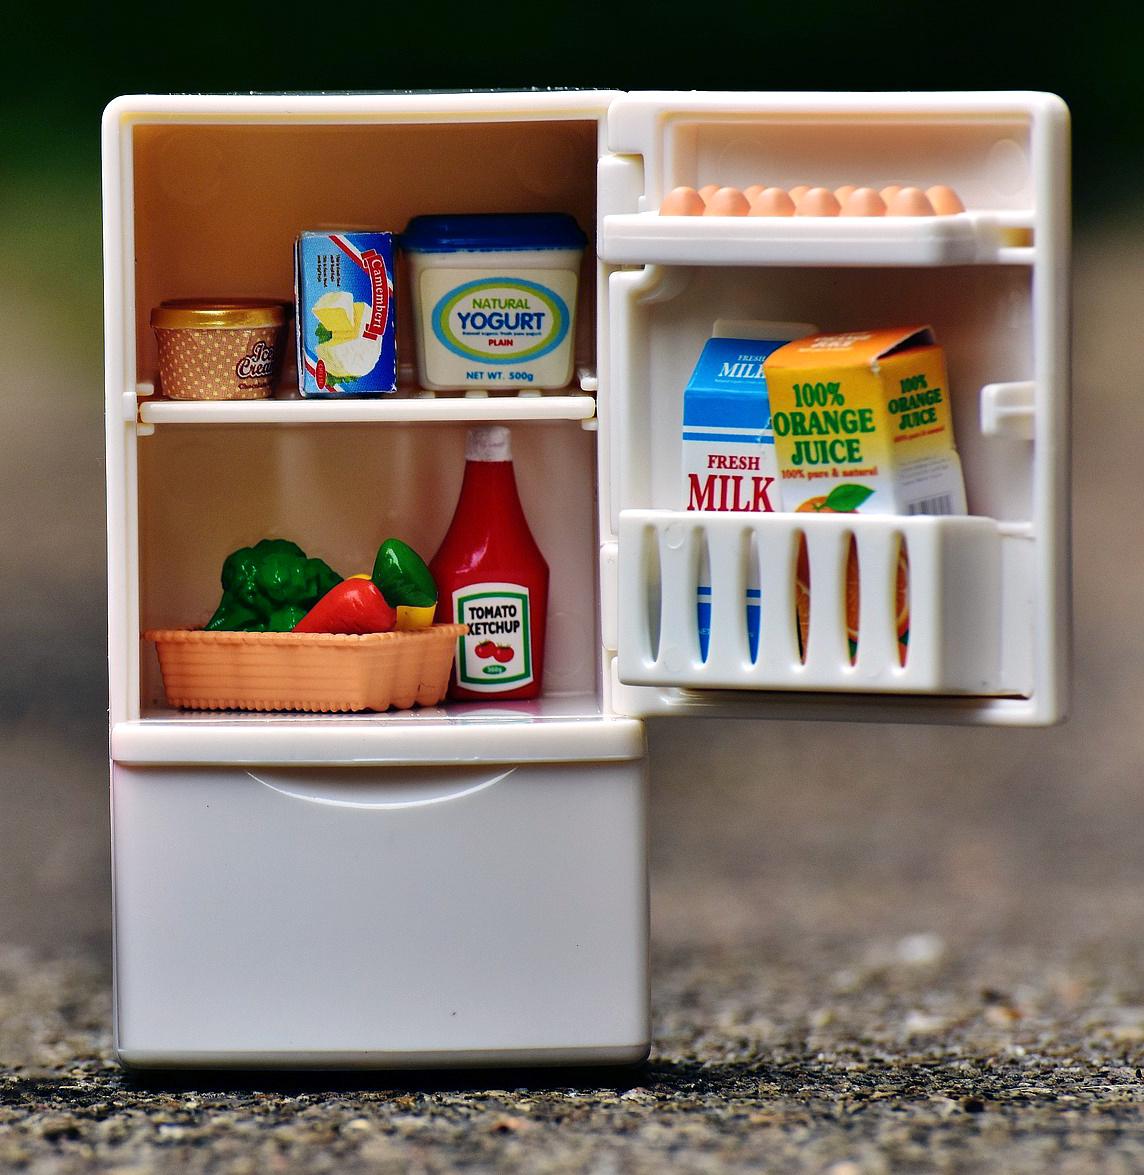 refrigerator image.jpg